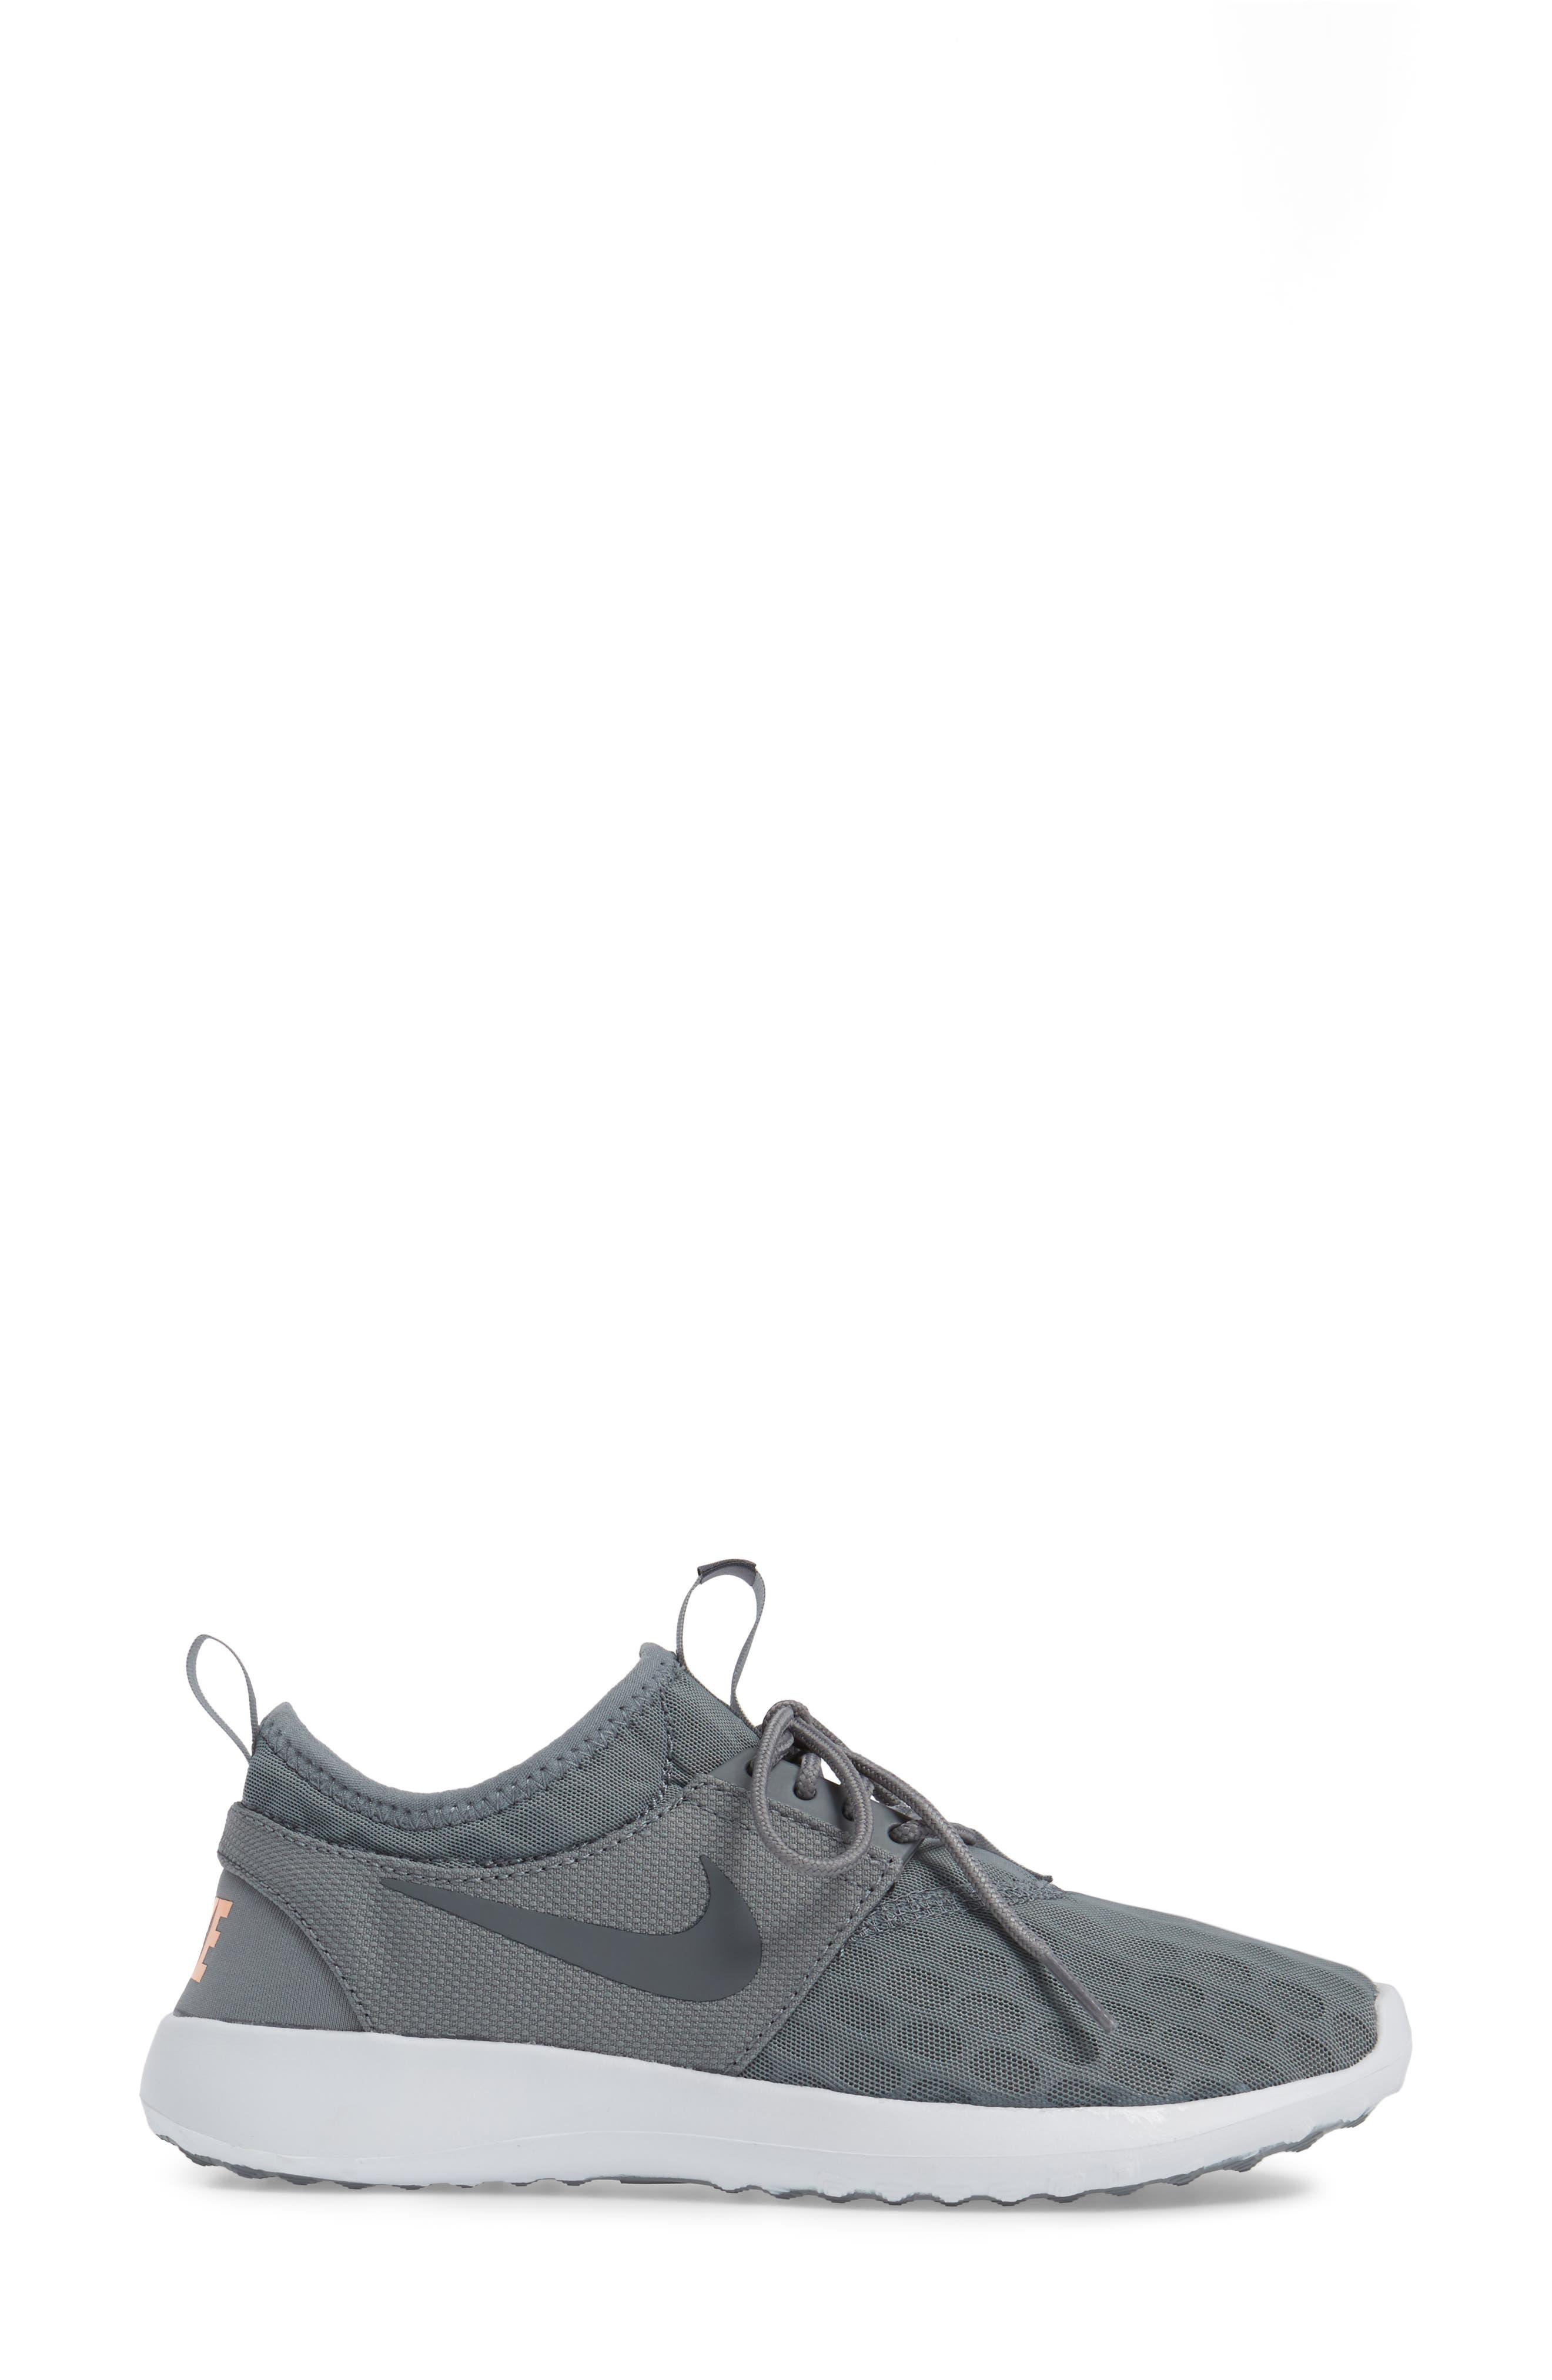 Juvenate Sneaker,                             Alternate thumbnail 128, color,